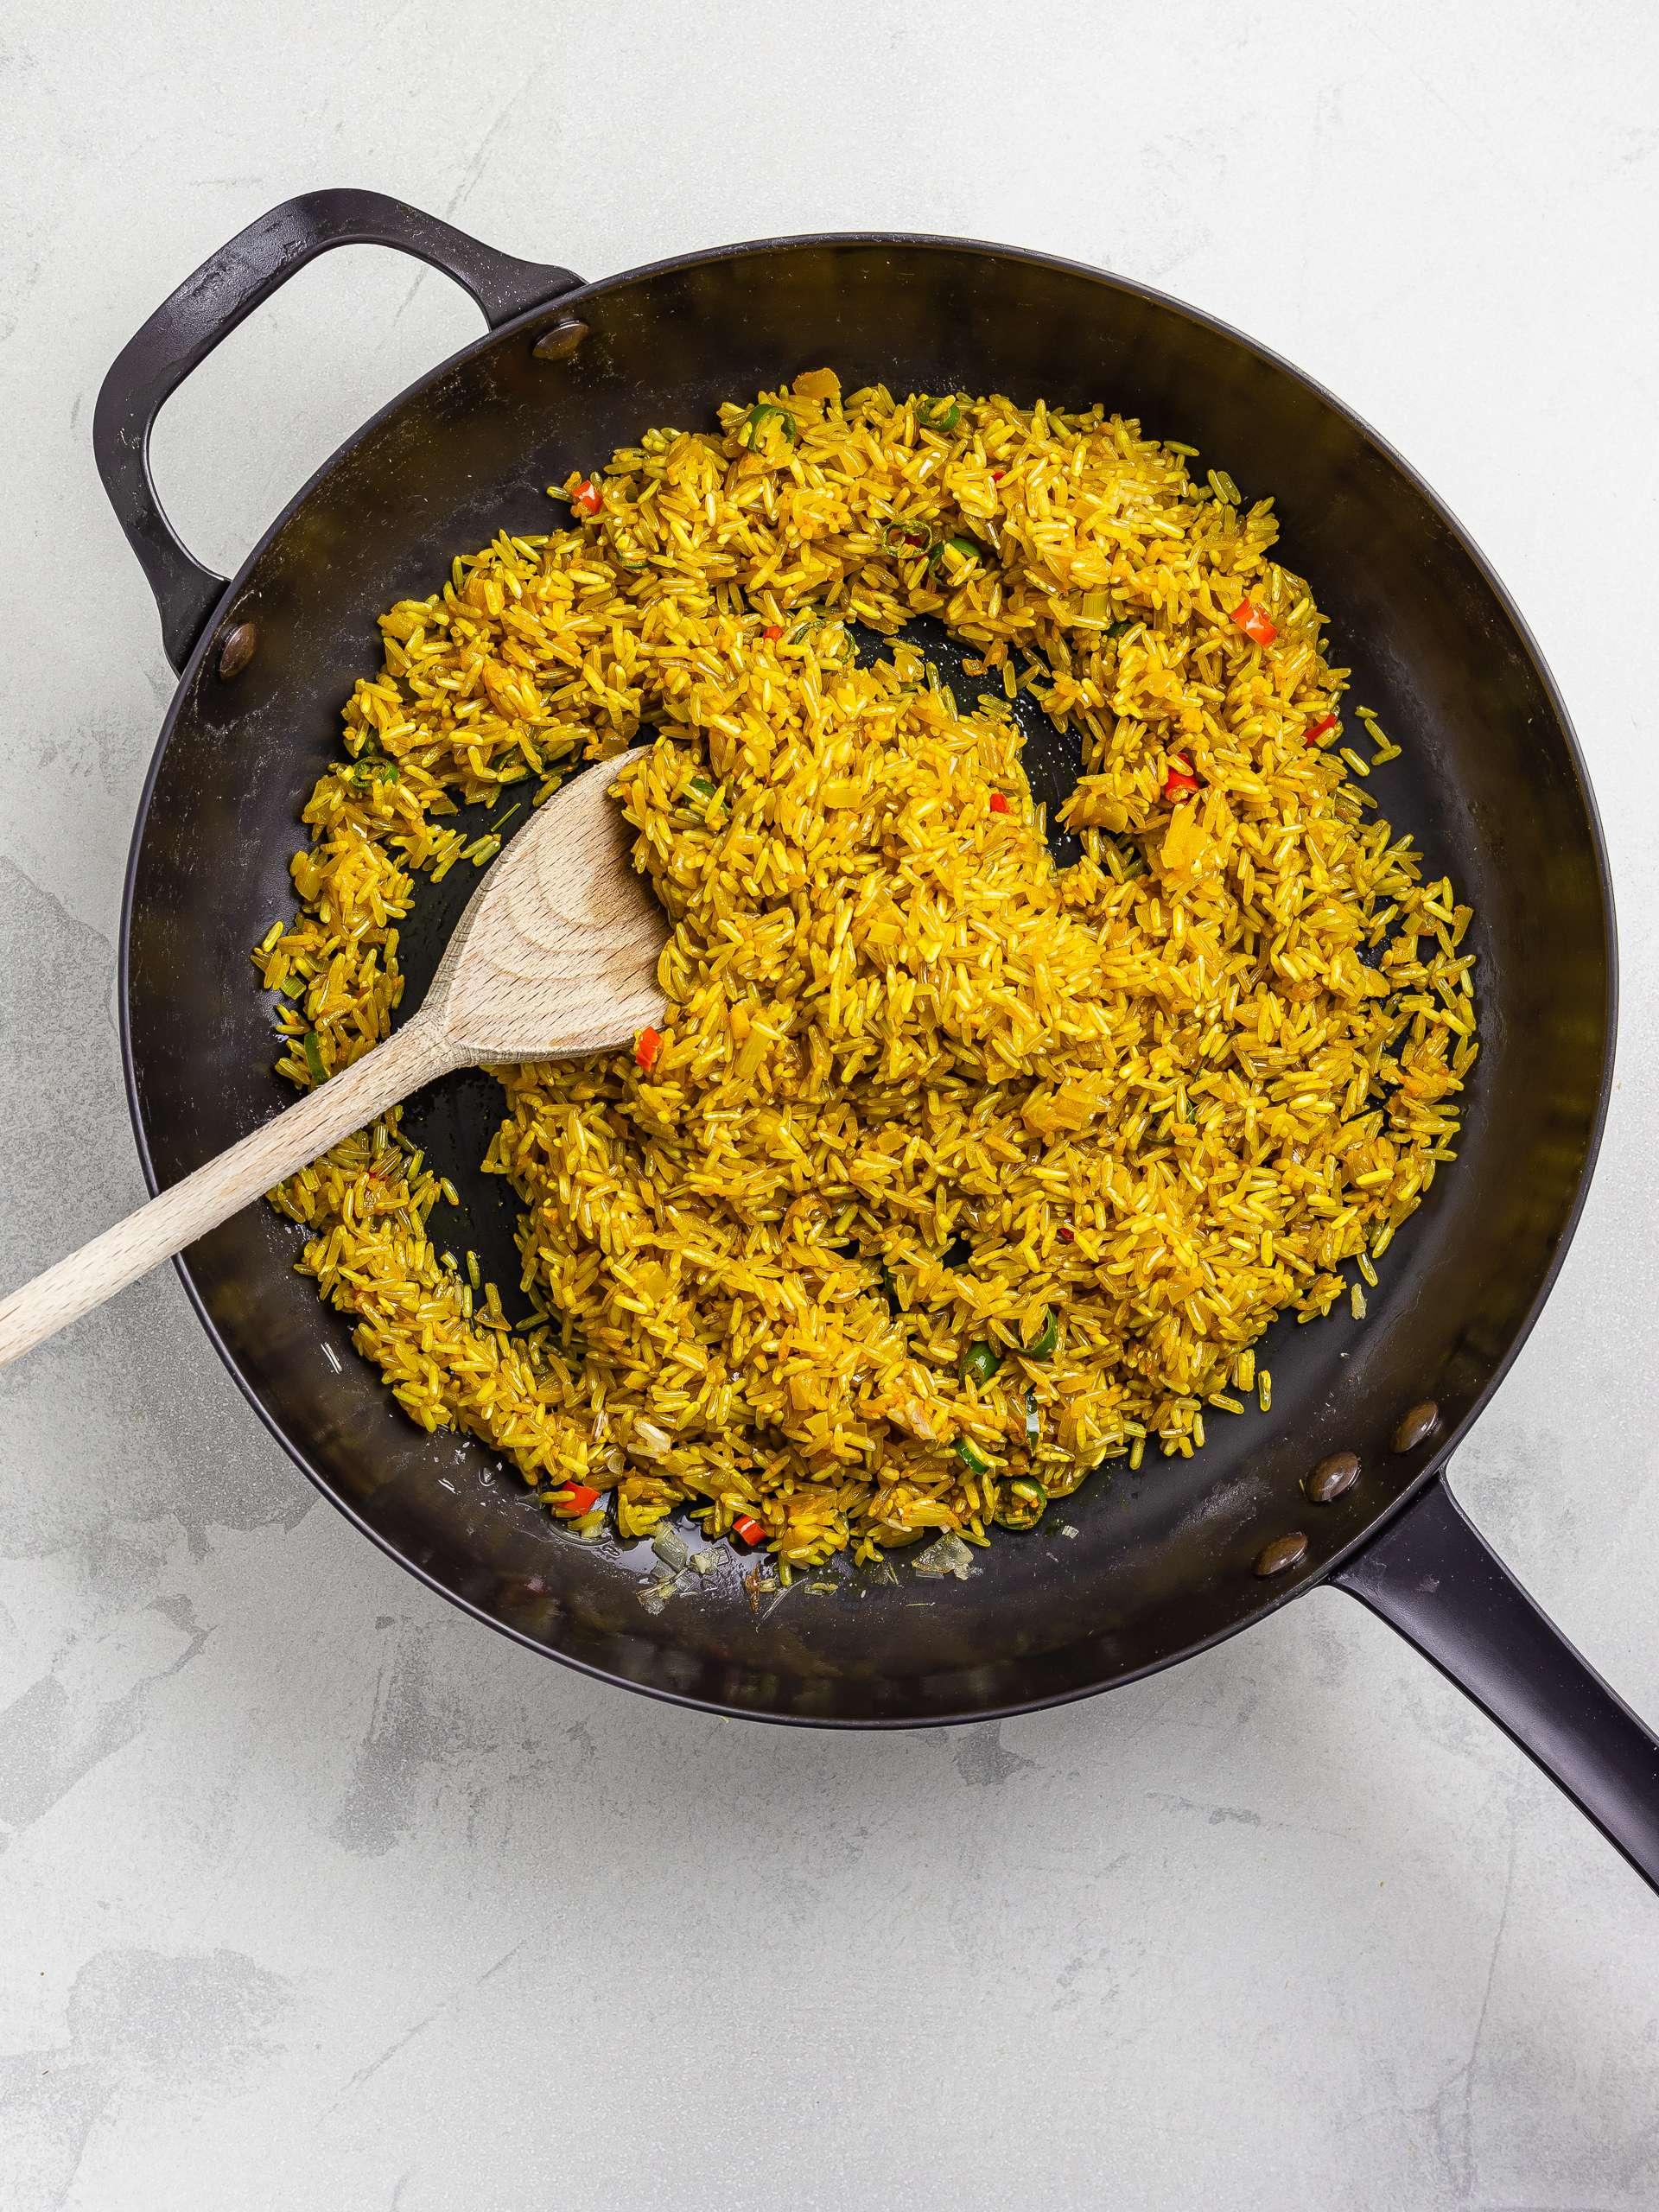 brown rice sautéed with turmeric